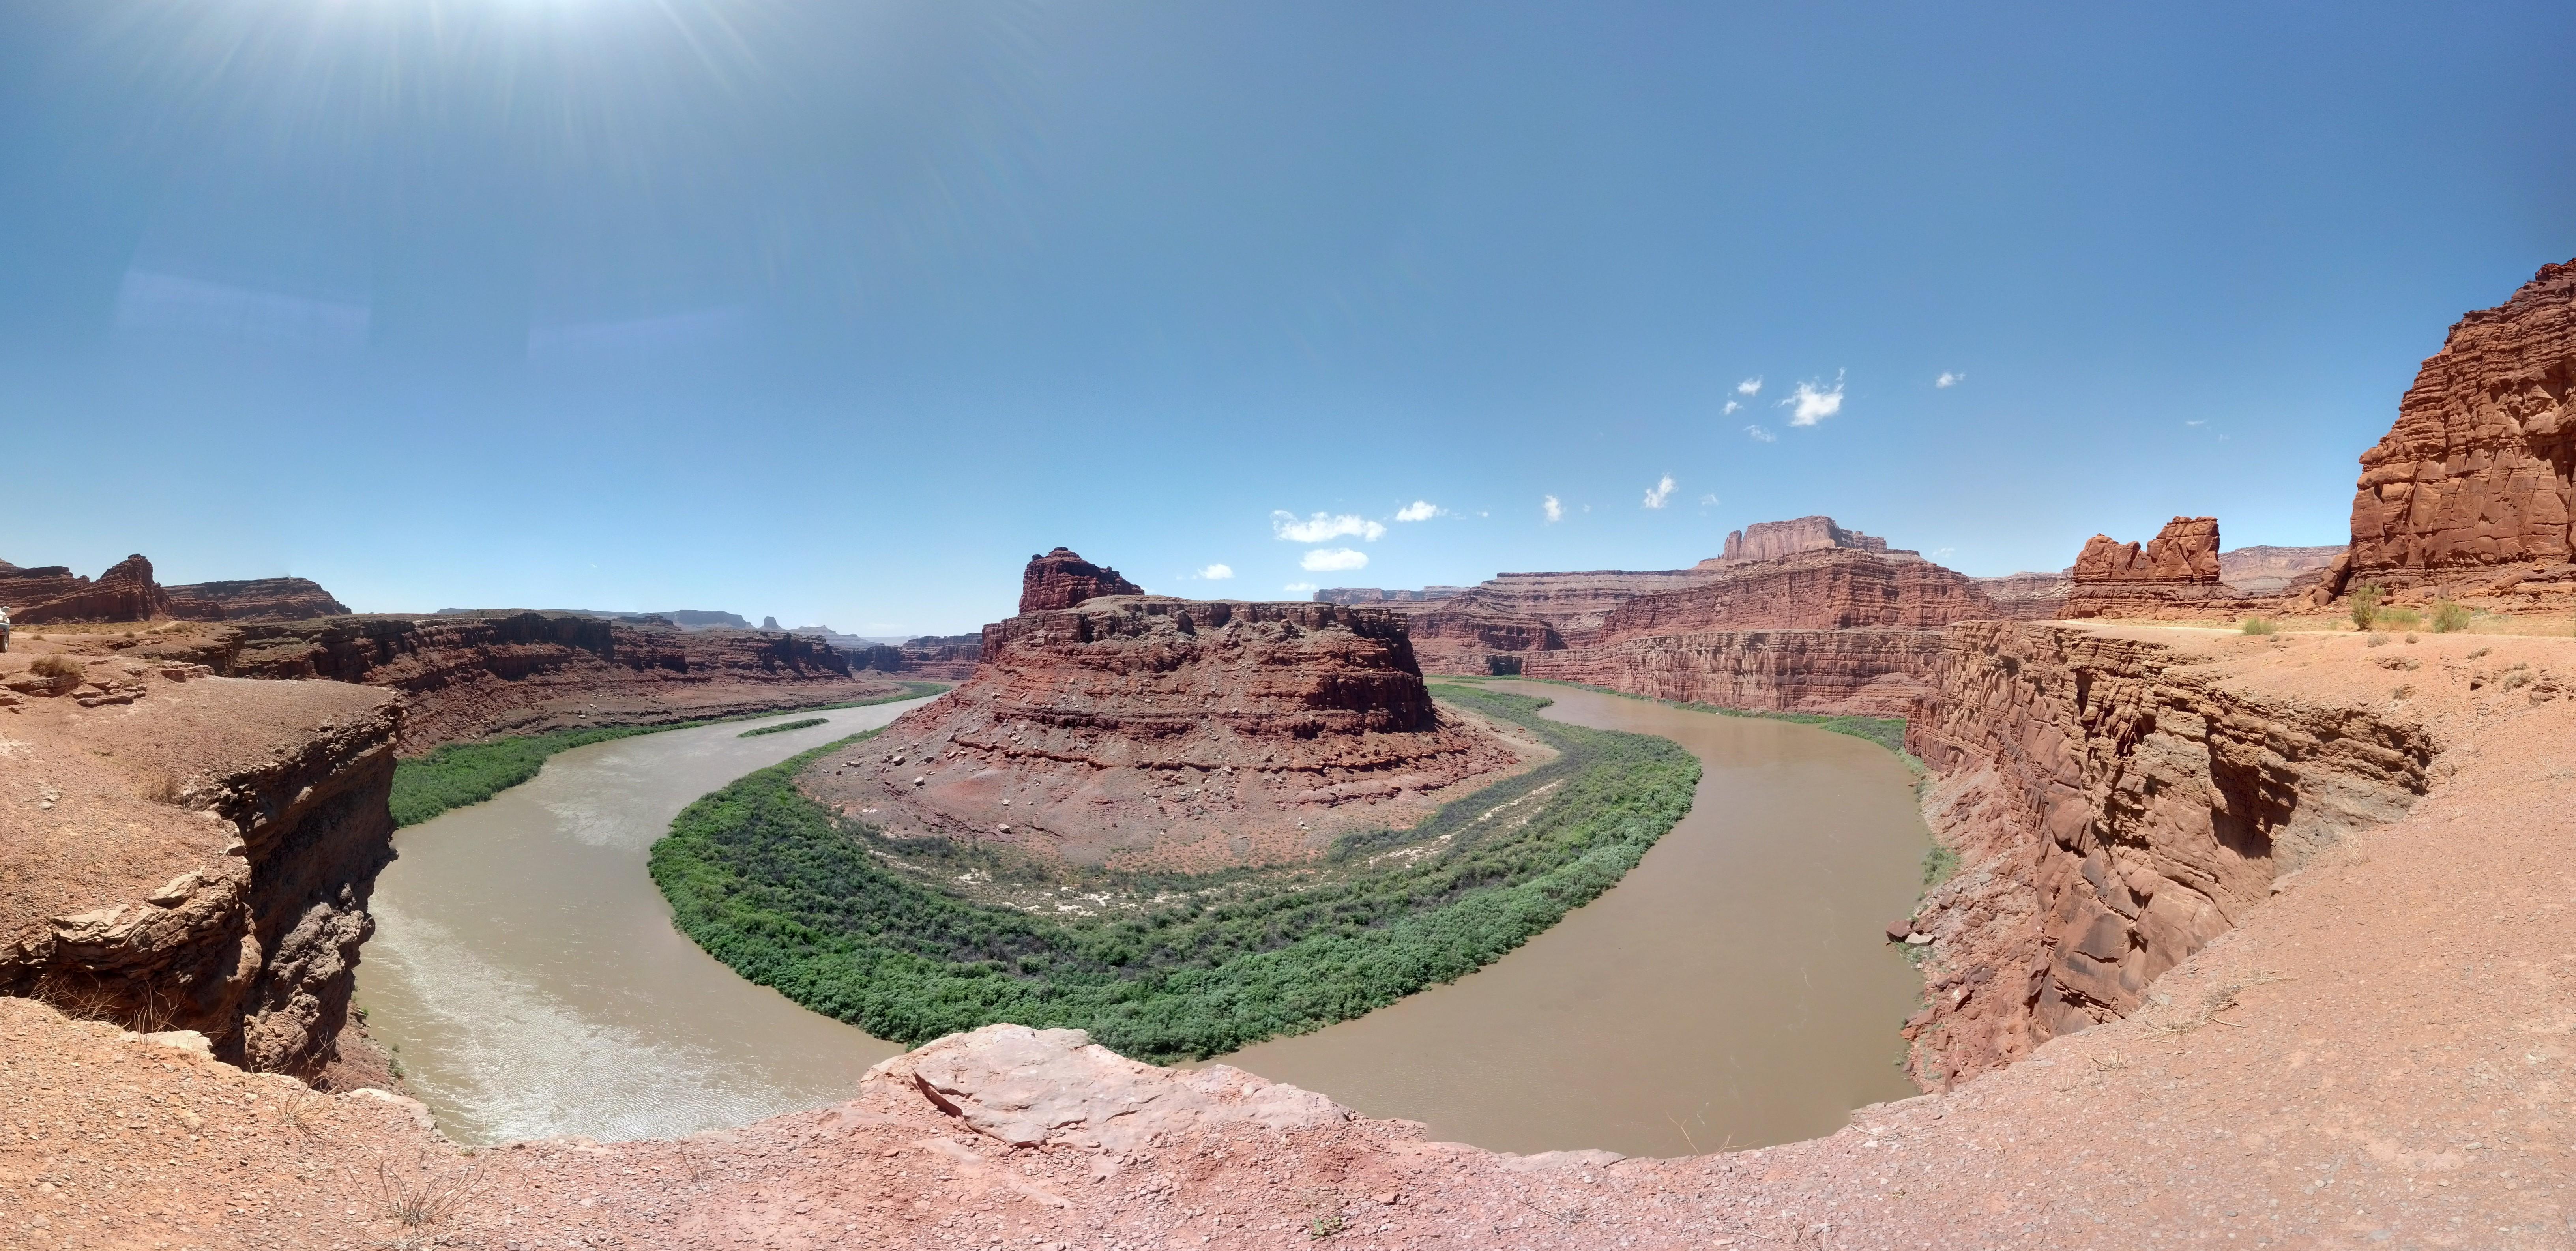 Gooneck Colorado River Shafer Trail